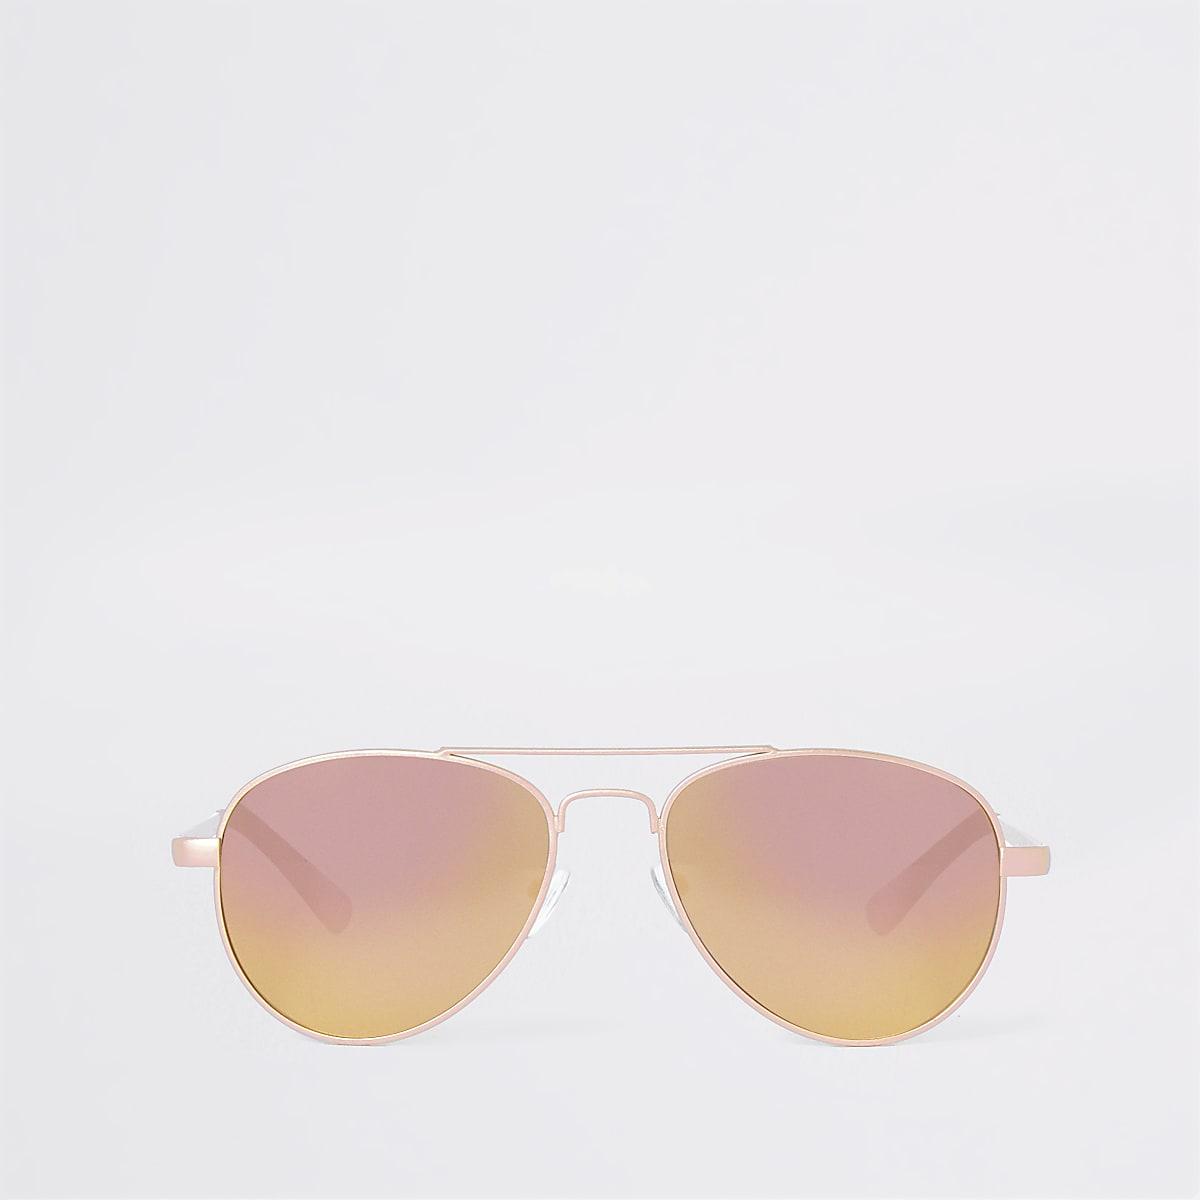 Girls gold tone mirror len aviator sunglasses